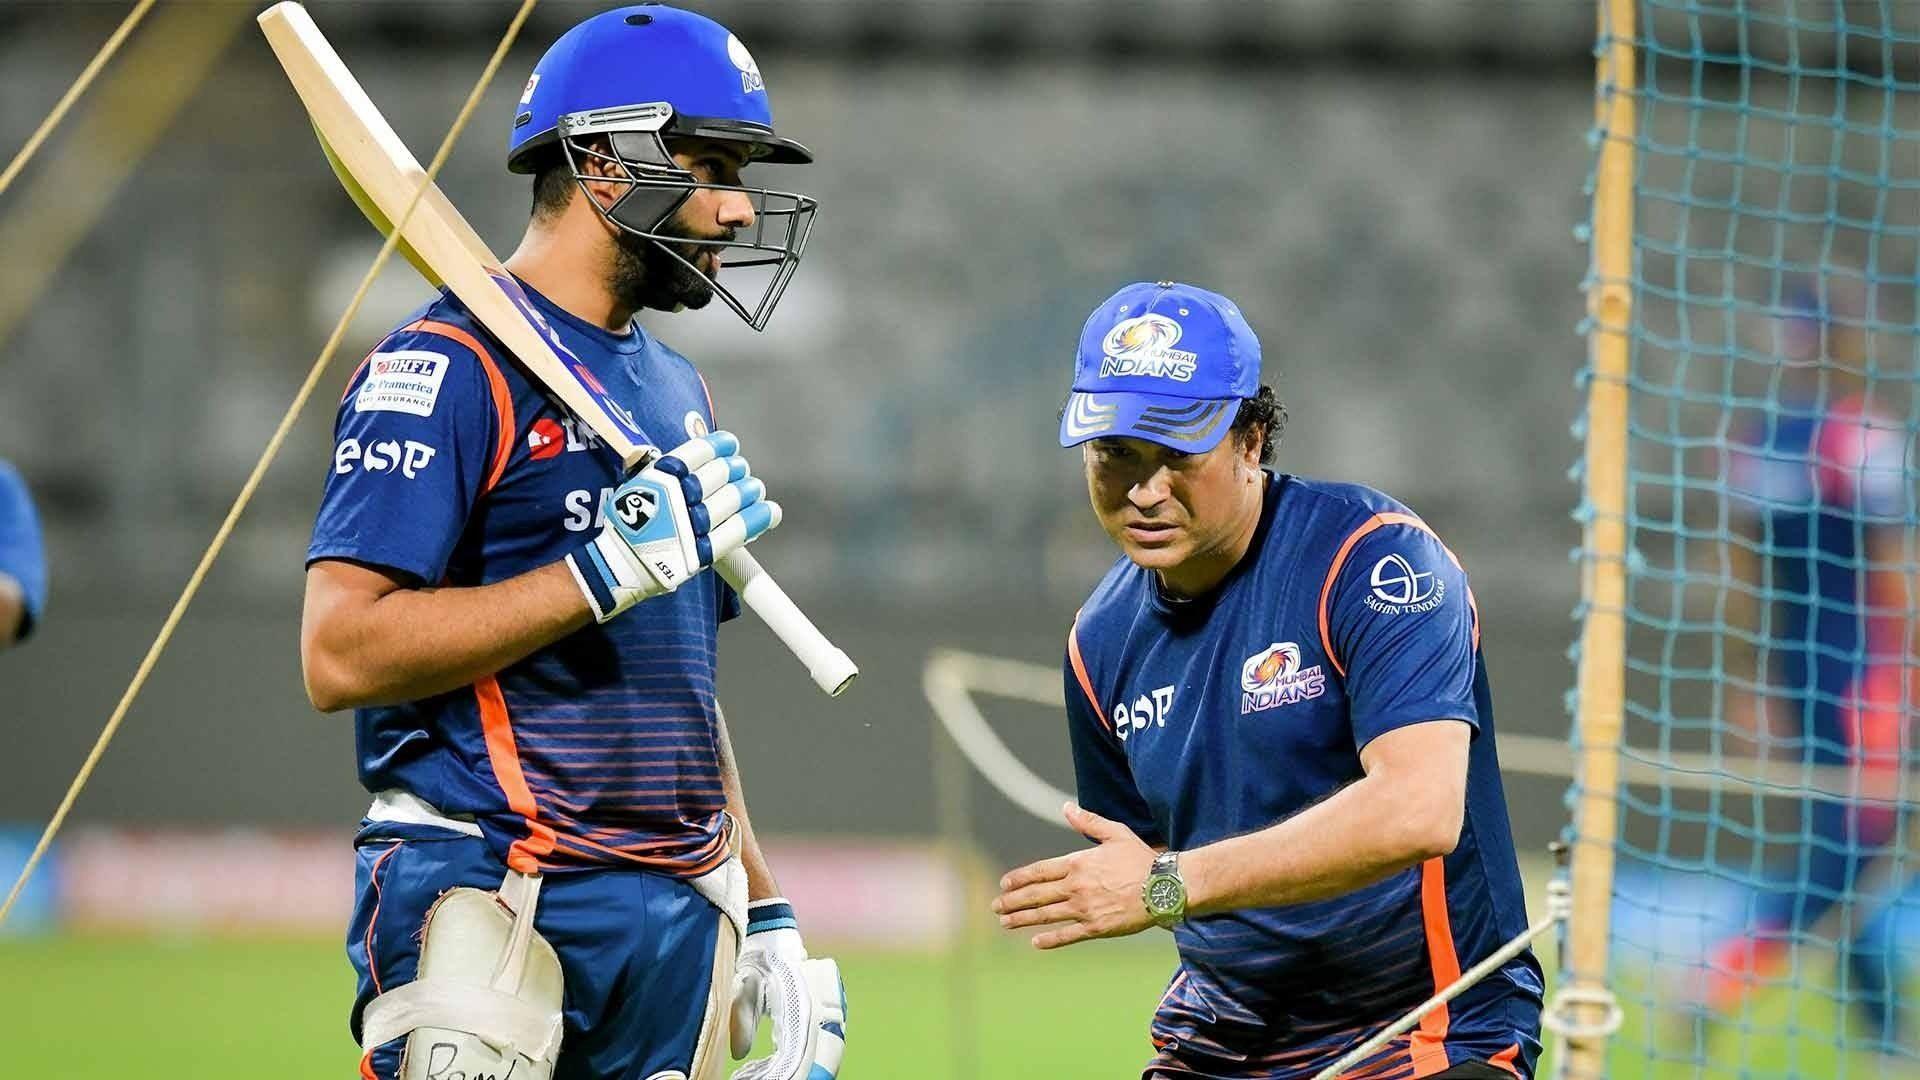 Rohit Sharma: I'd like to bring Sachin and Pollock back - Mumbai Indians